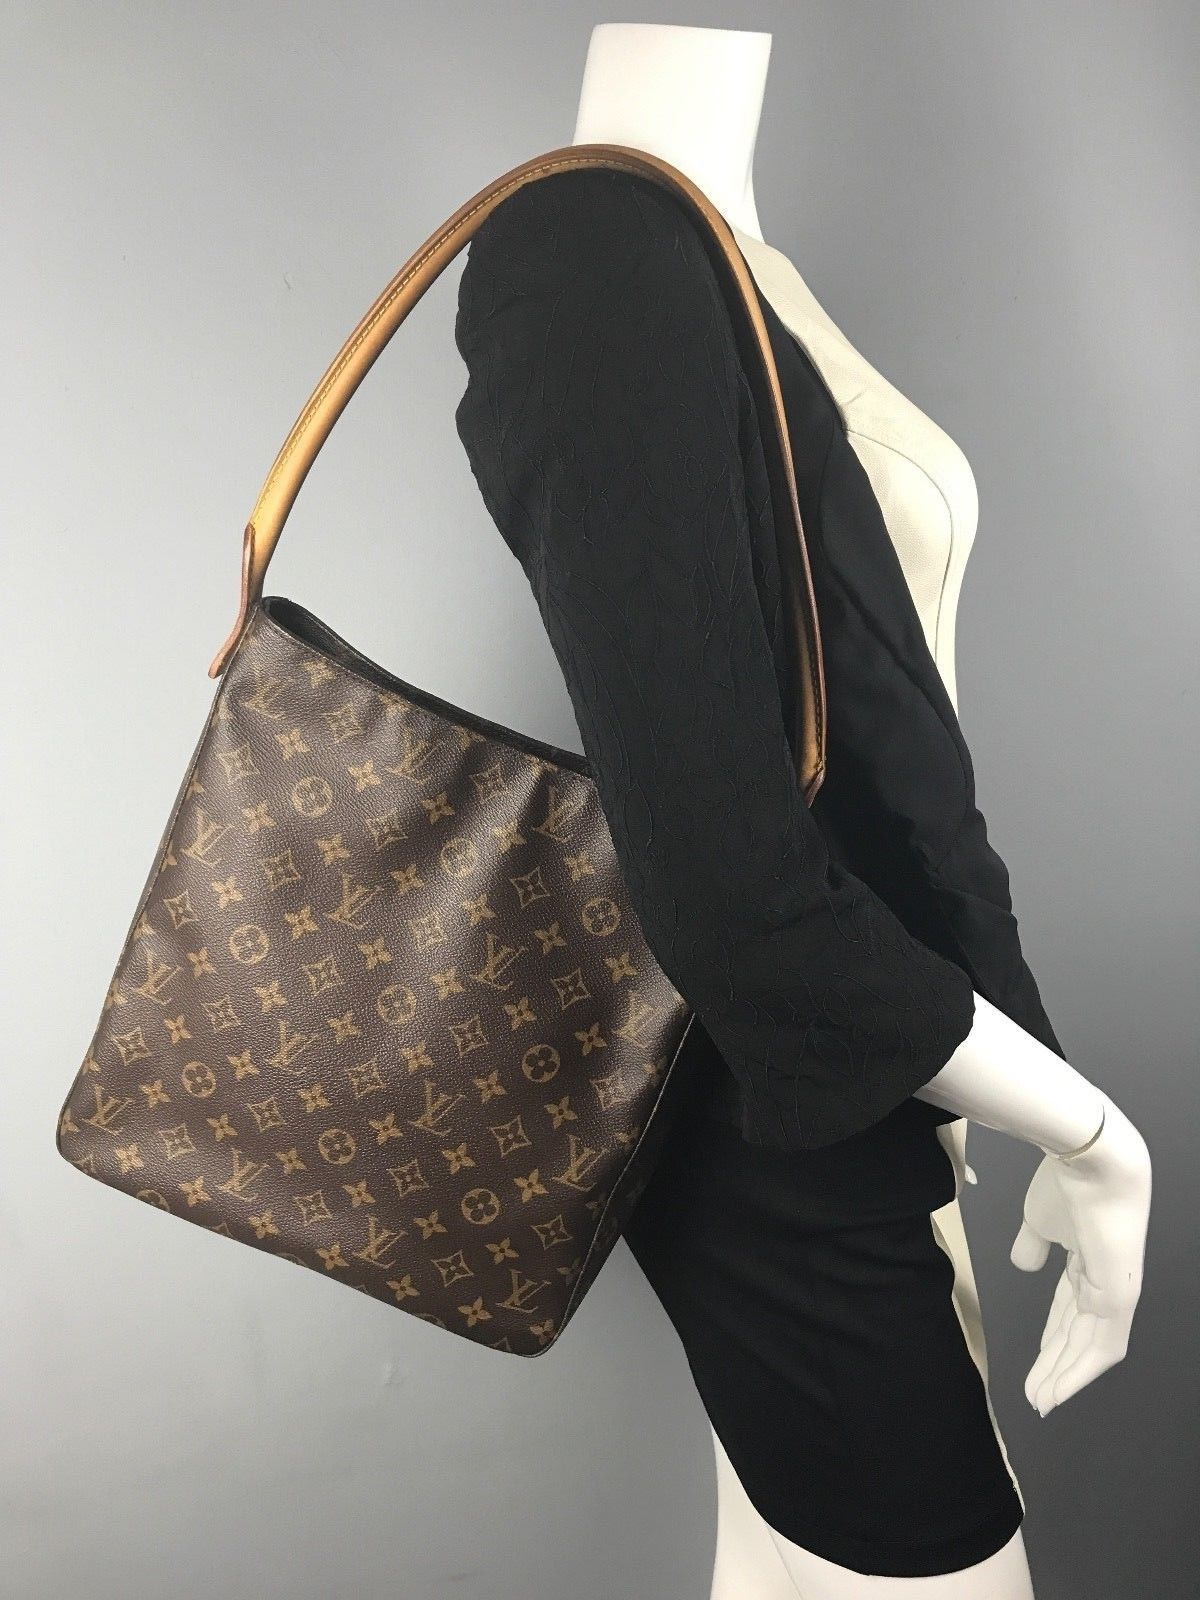 304297e3b8c35 AUTH Louis Vuitton Monogram Looping Gm Shoulder Bag MI0999 France ...